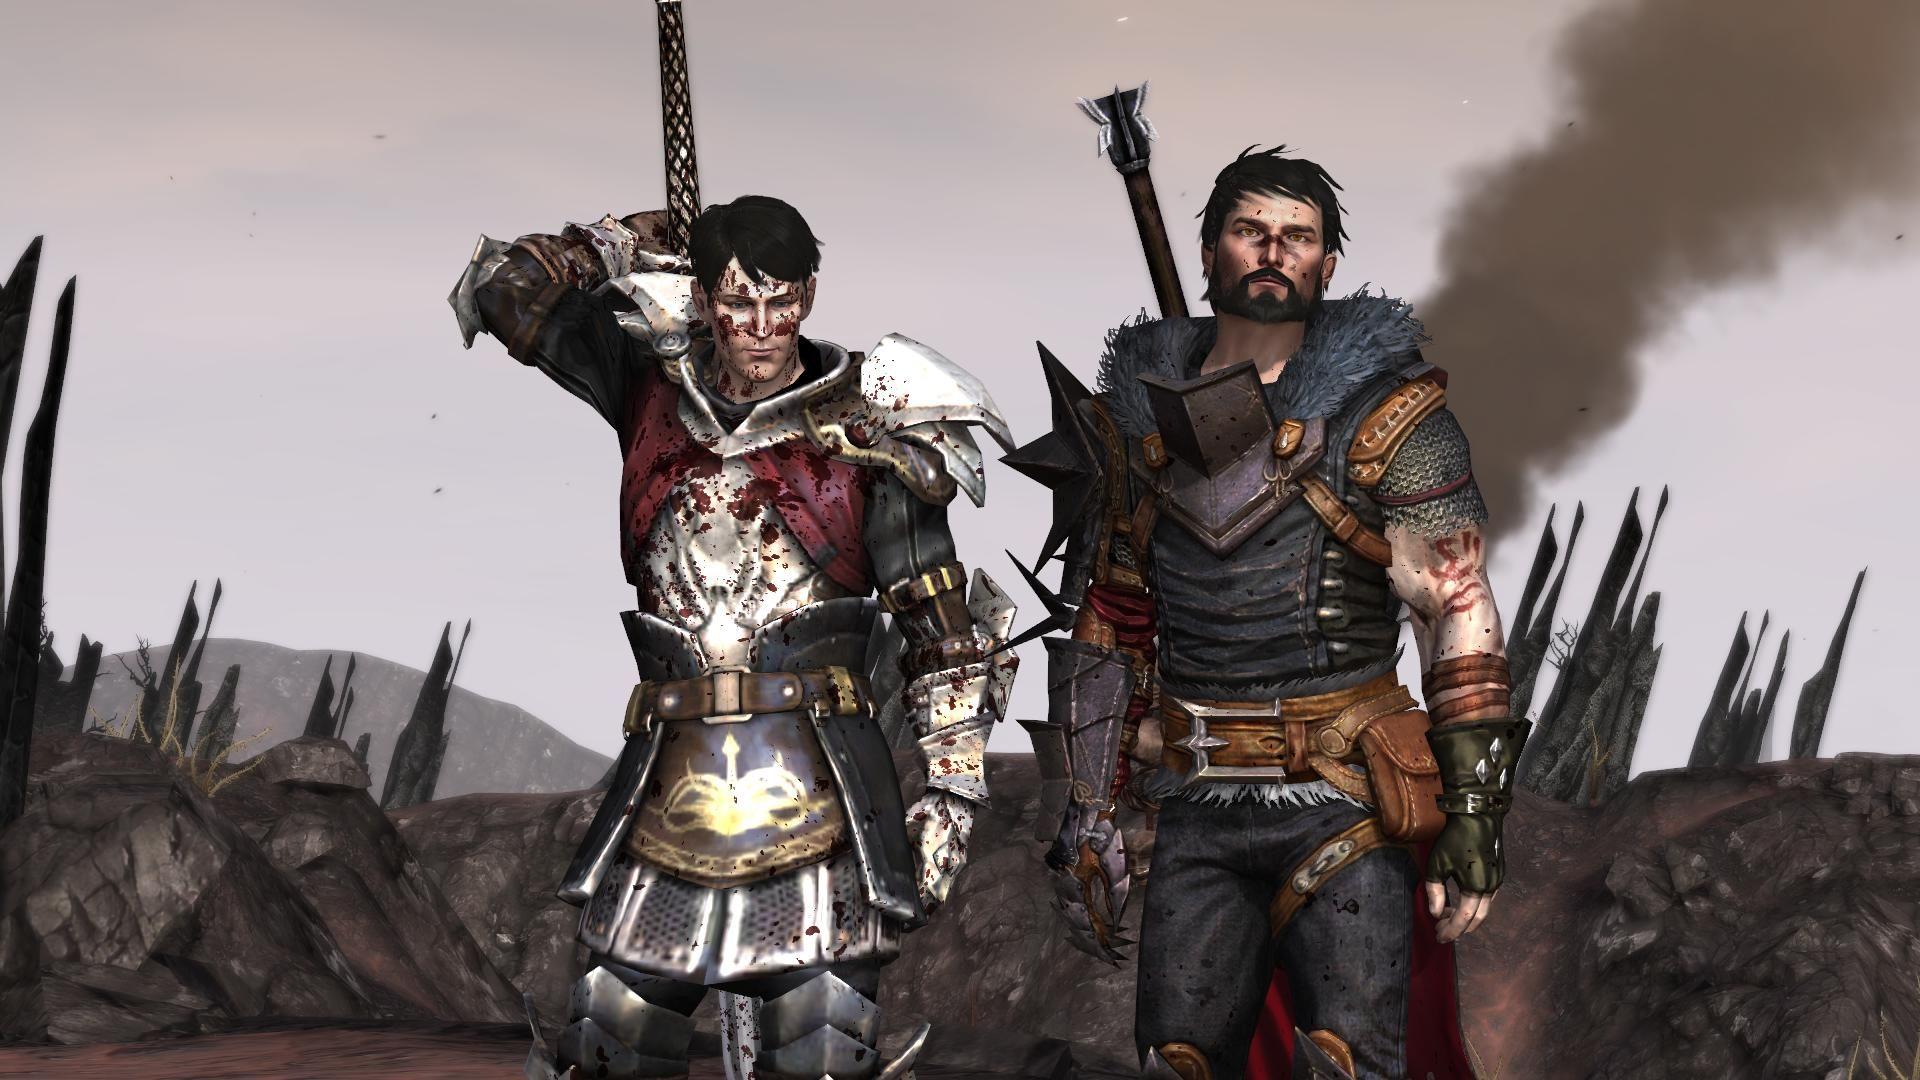 Dragon Age 2 1080p Wallpaper Games Wallpapers Hd